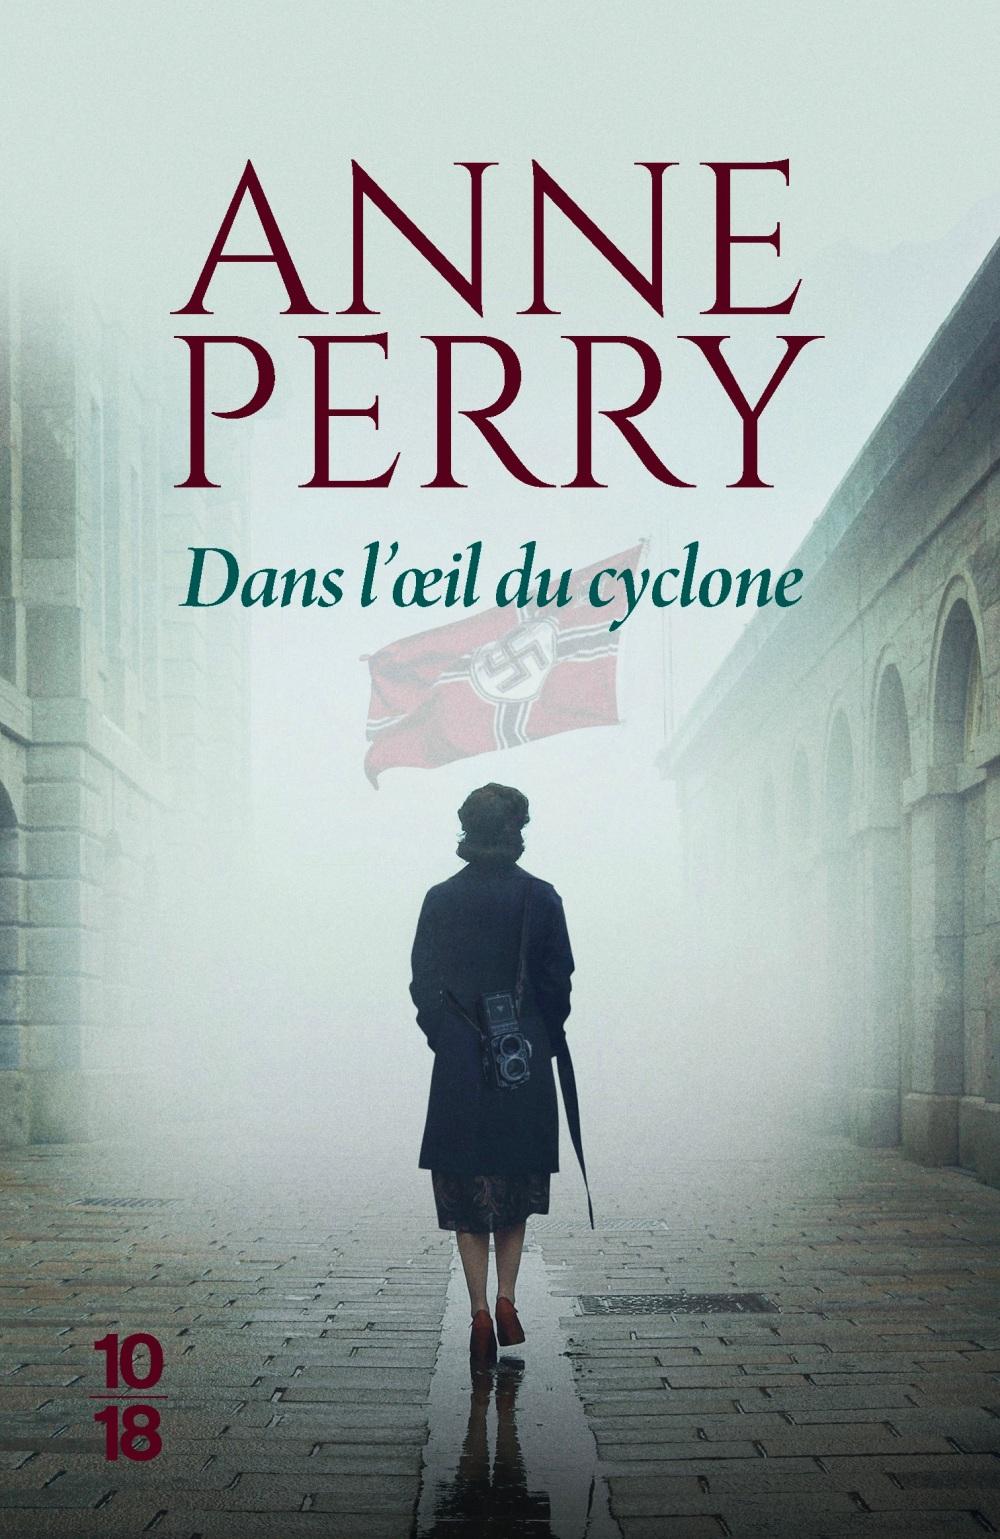 PERRY_dansl'oeilducyclone10